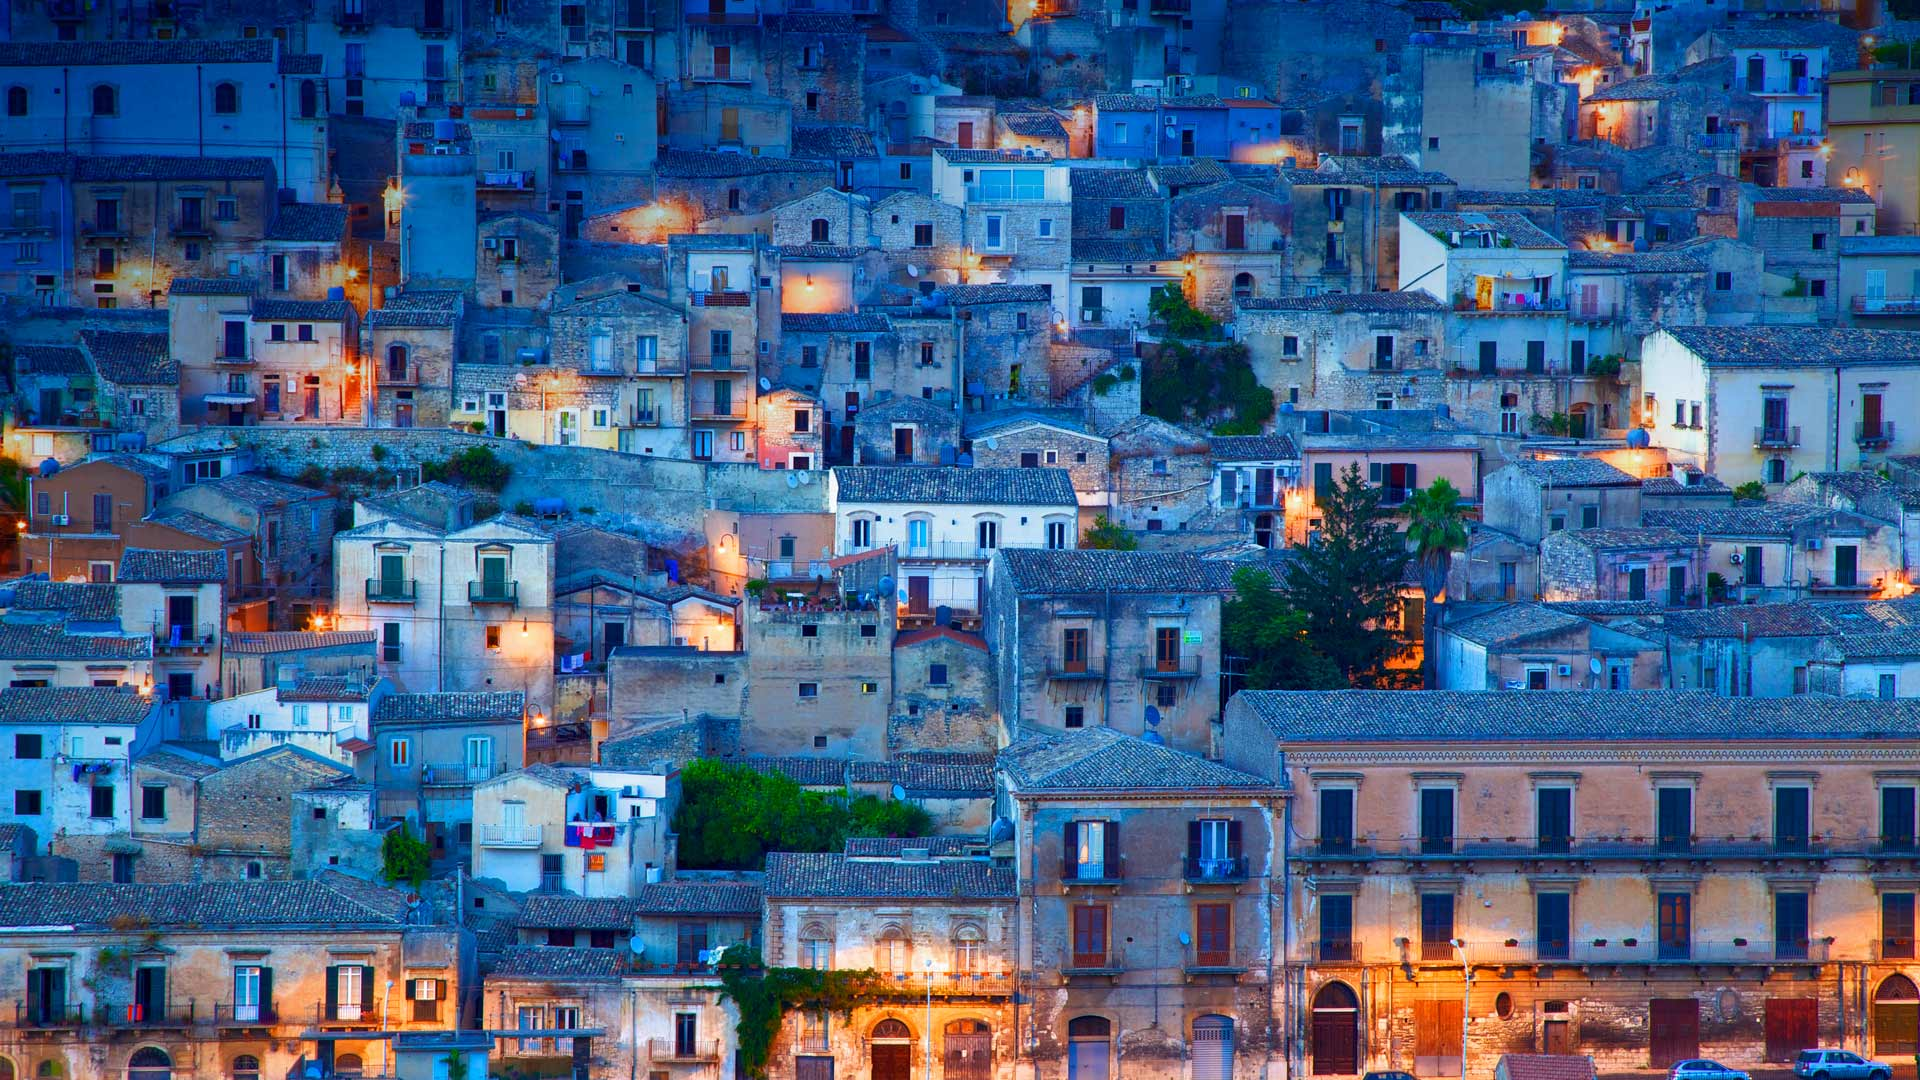 Modica, Sicily, Italy (© Robert Harding World Imagery/Offset)